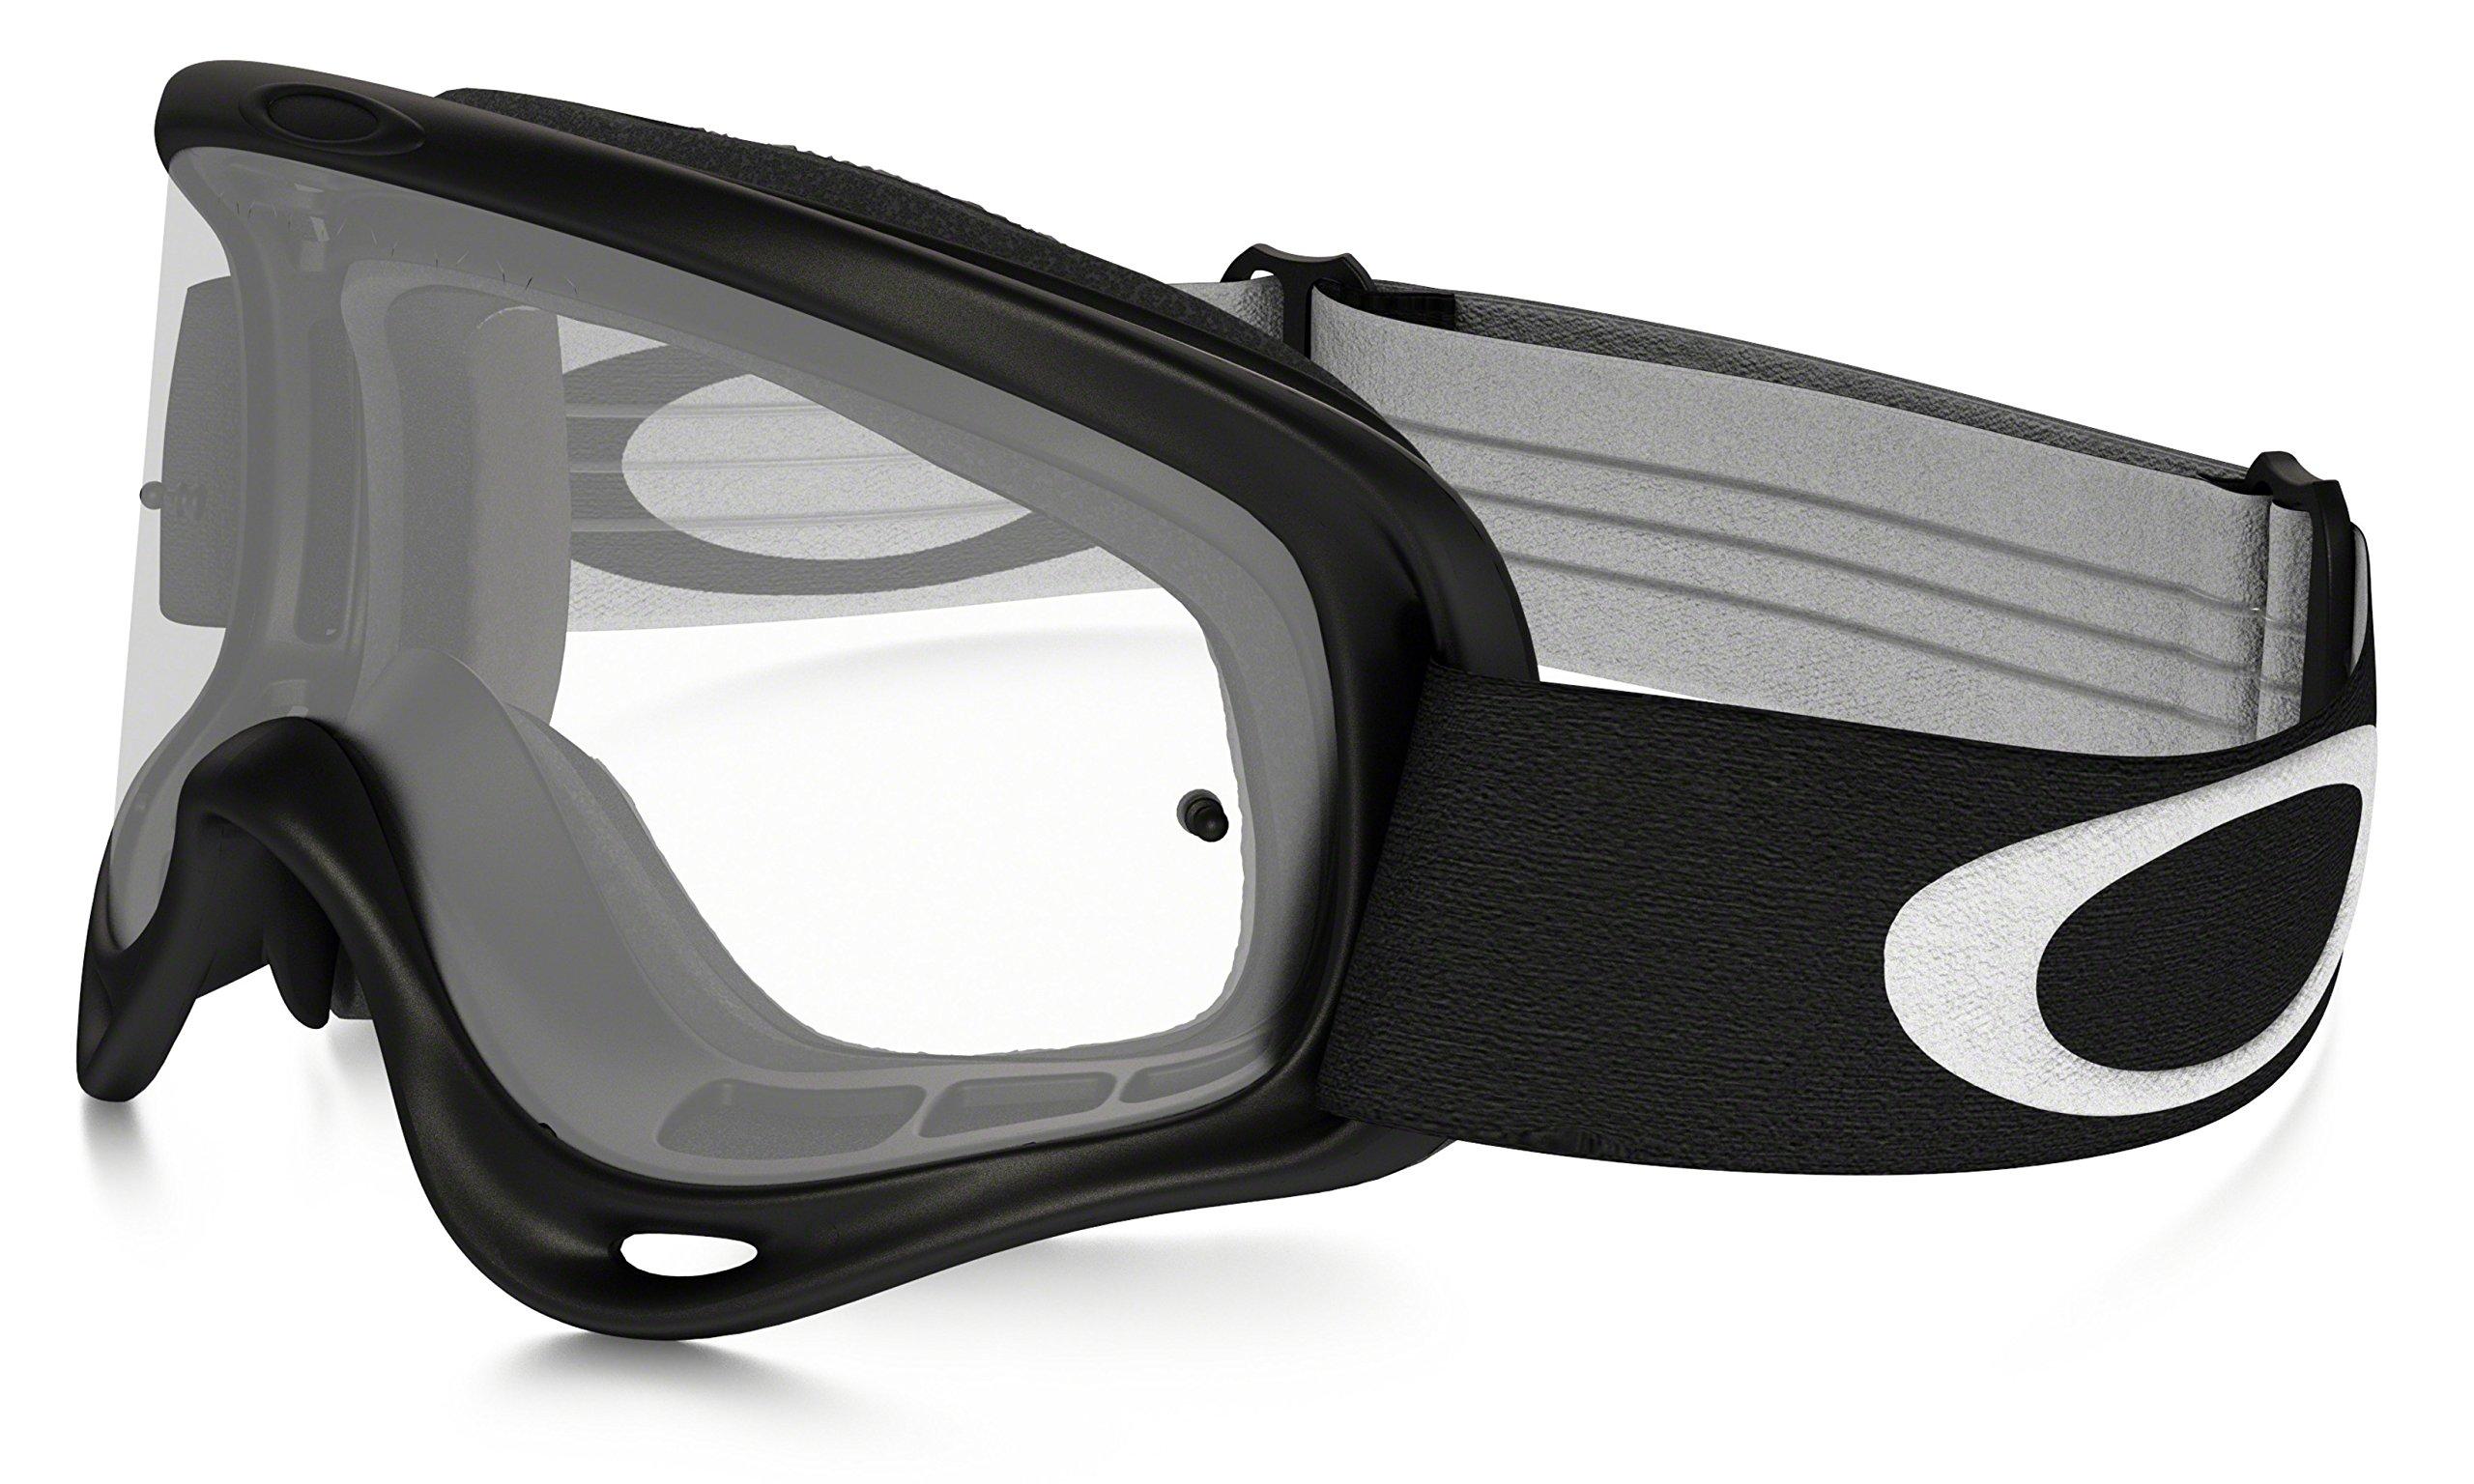 98f181bc3d26 Get Quotations · Oakley O-Frame Graphic Frame MX Goggles (True Carbon  Fiber Clear Lens